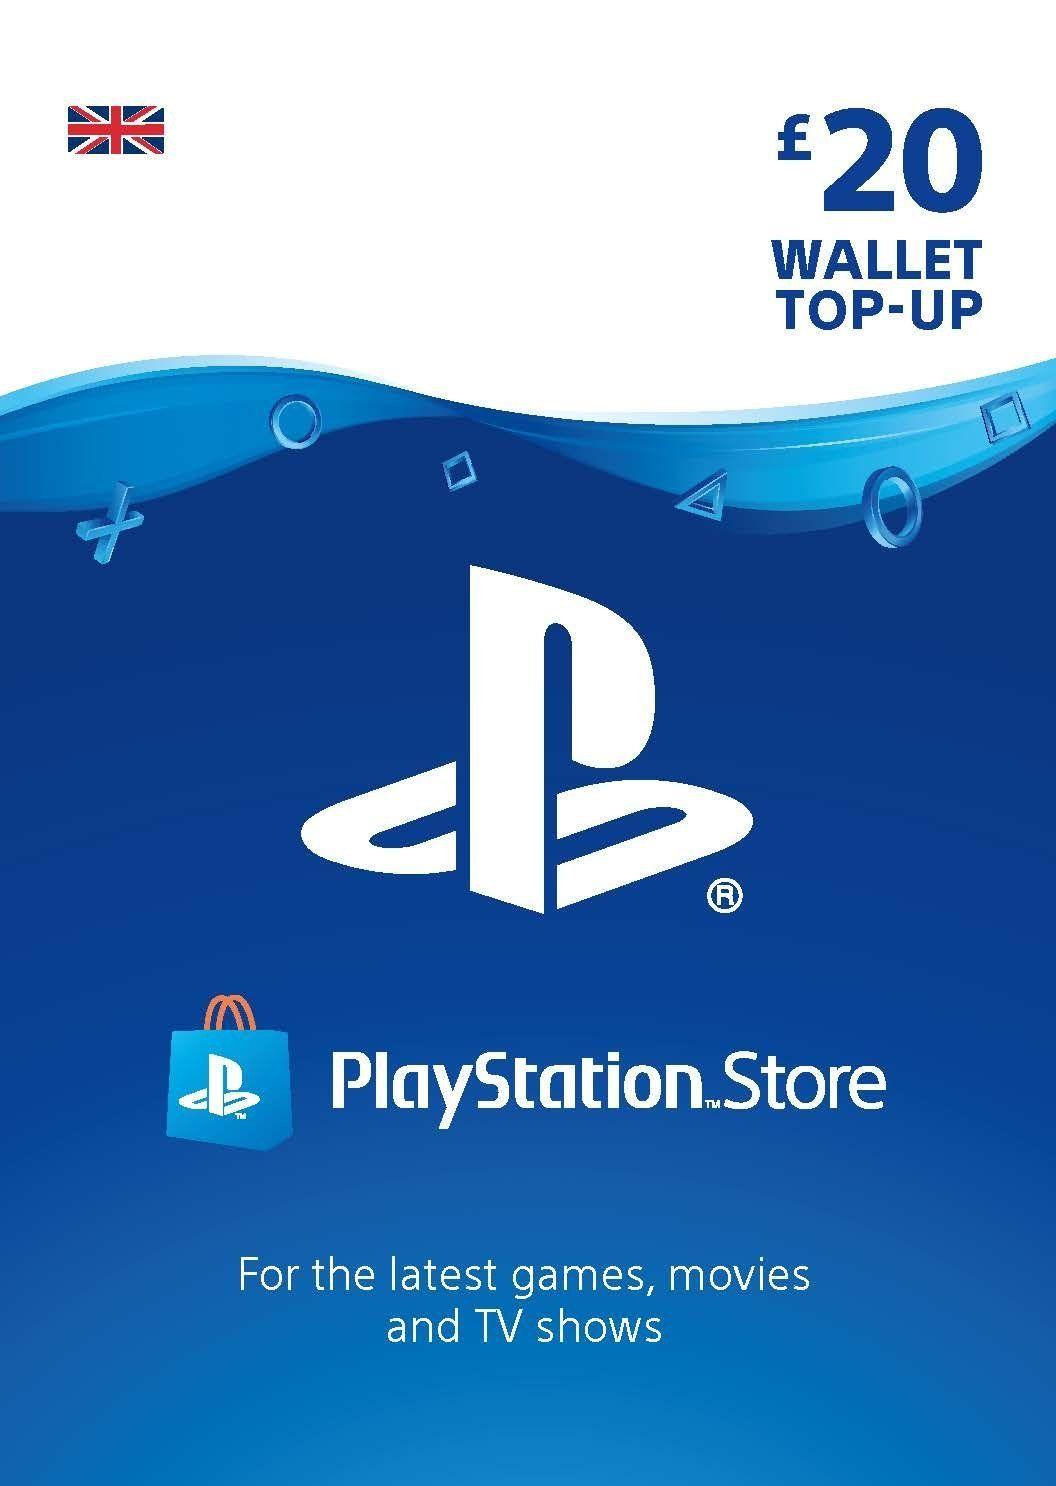 PlayStation PSN Card 20 GBP Wallet Top Up | PSN Download